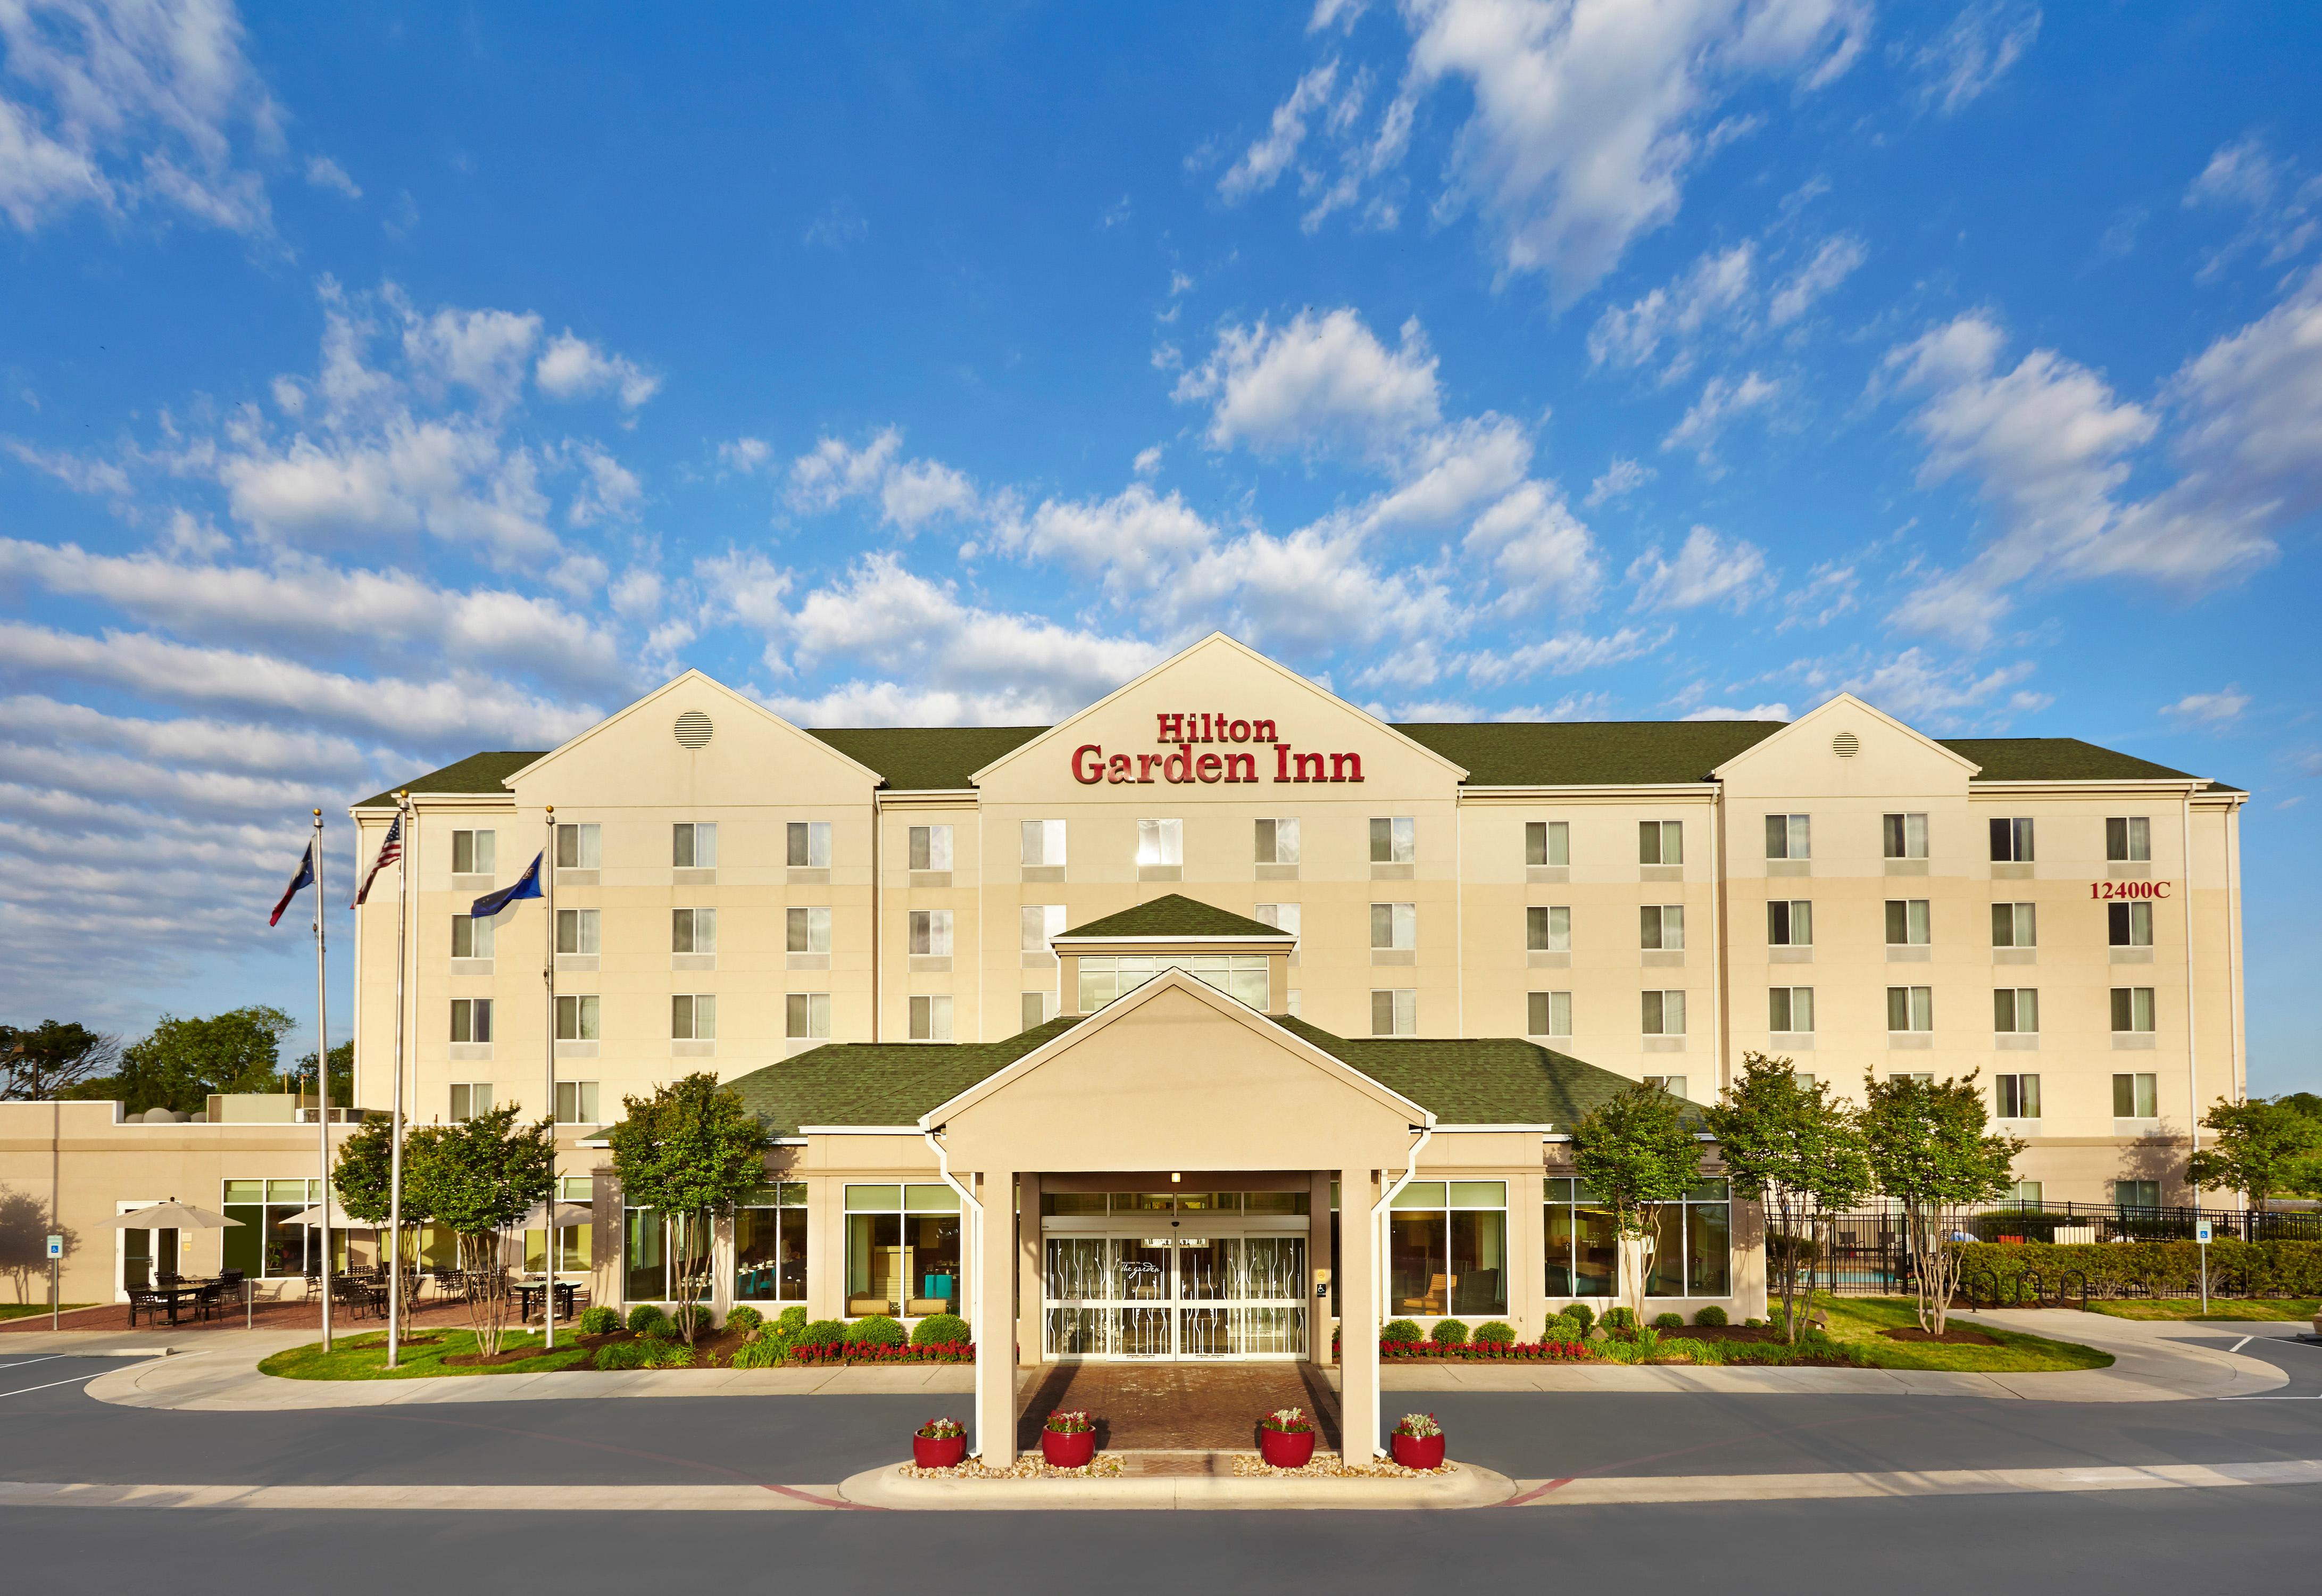 Hilton Garden Inn Austin North 12400 North Ih 35 Austin Tx